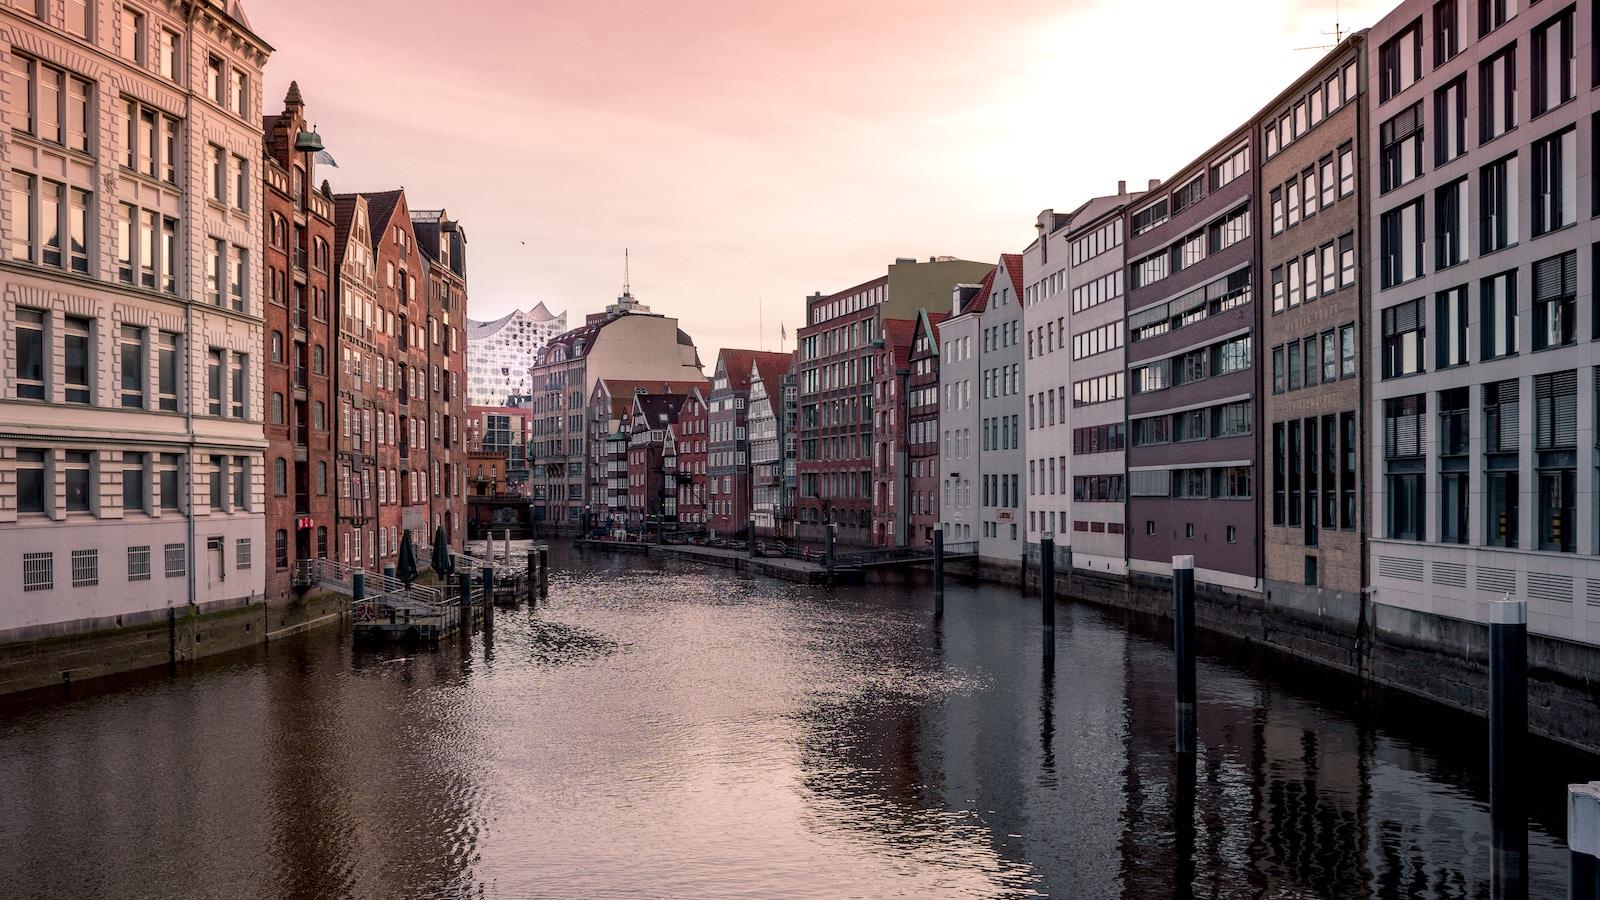 Kurierdienst Hamburg